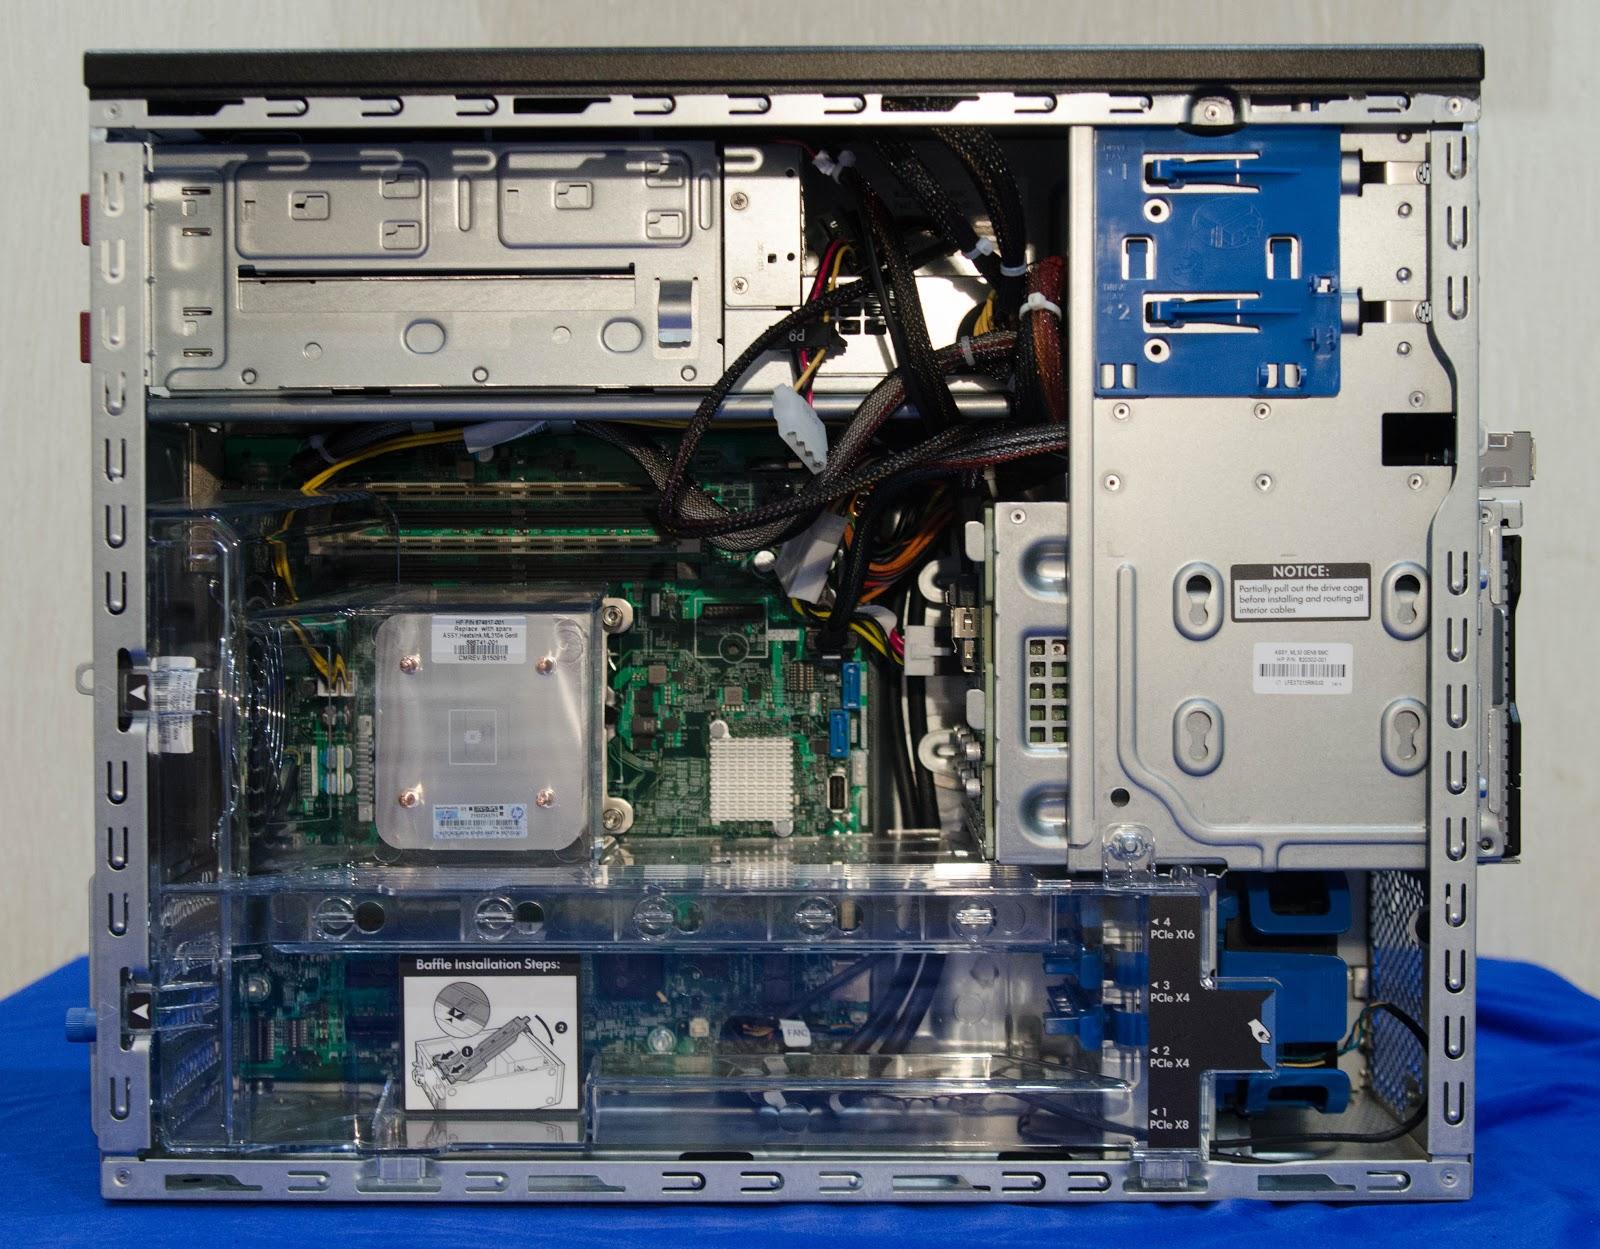 MаL, да удал: Обзор младших серверов линейки HPE ProLiant ML - 9